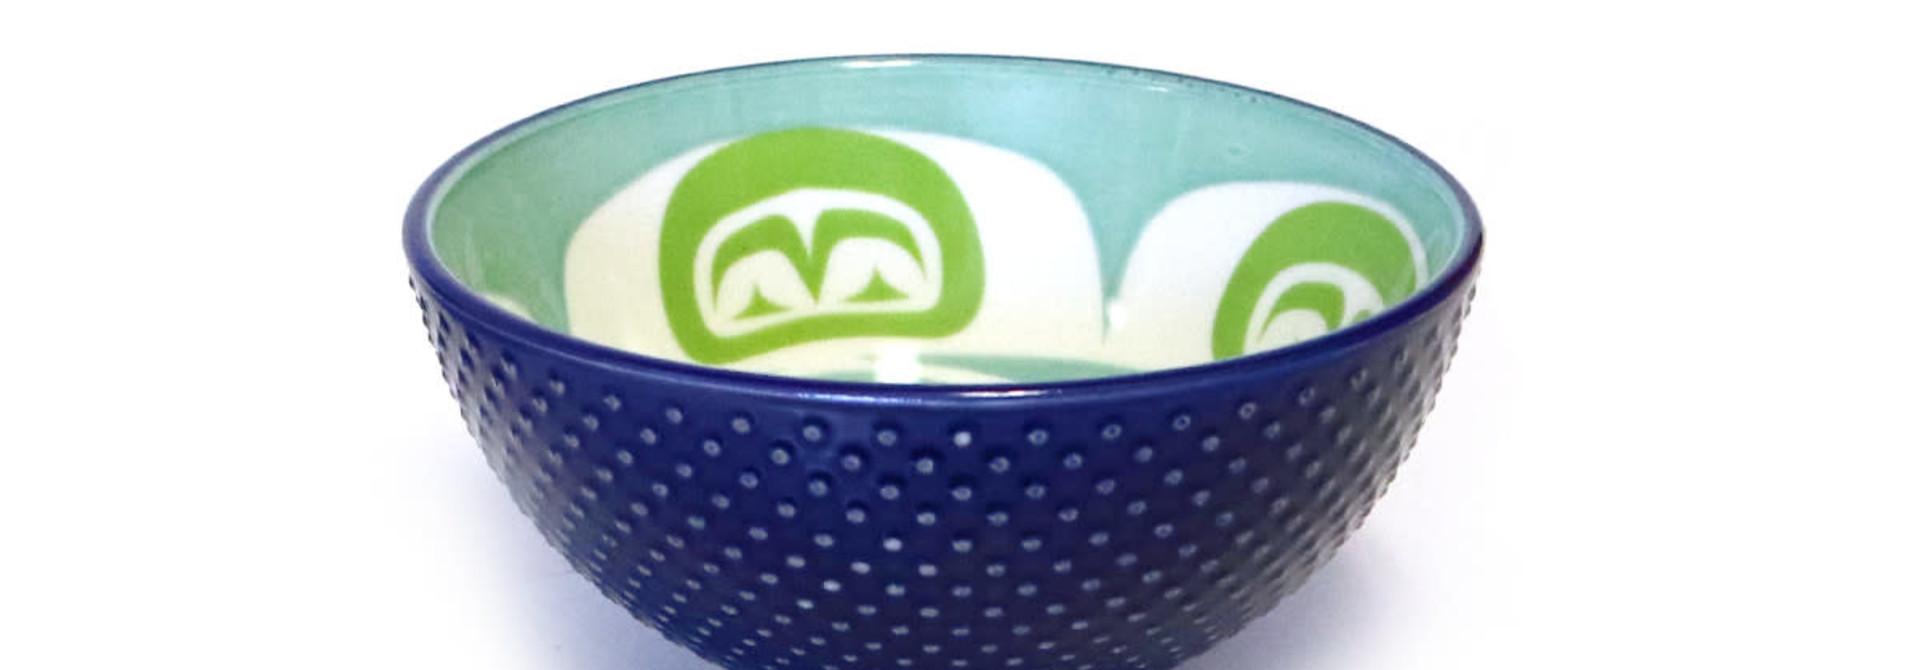 Porcelain Art Bowl - Small